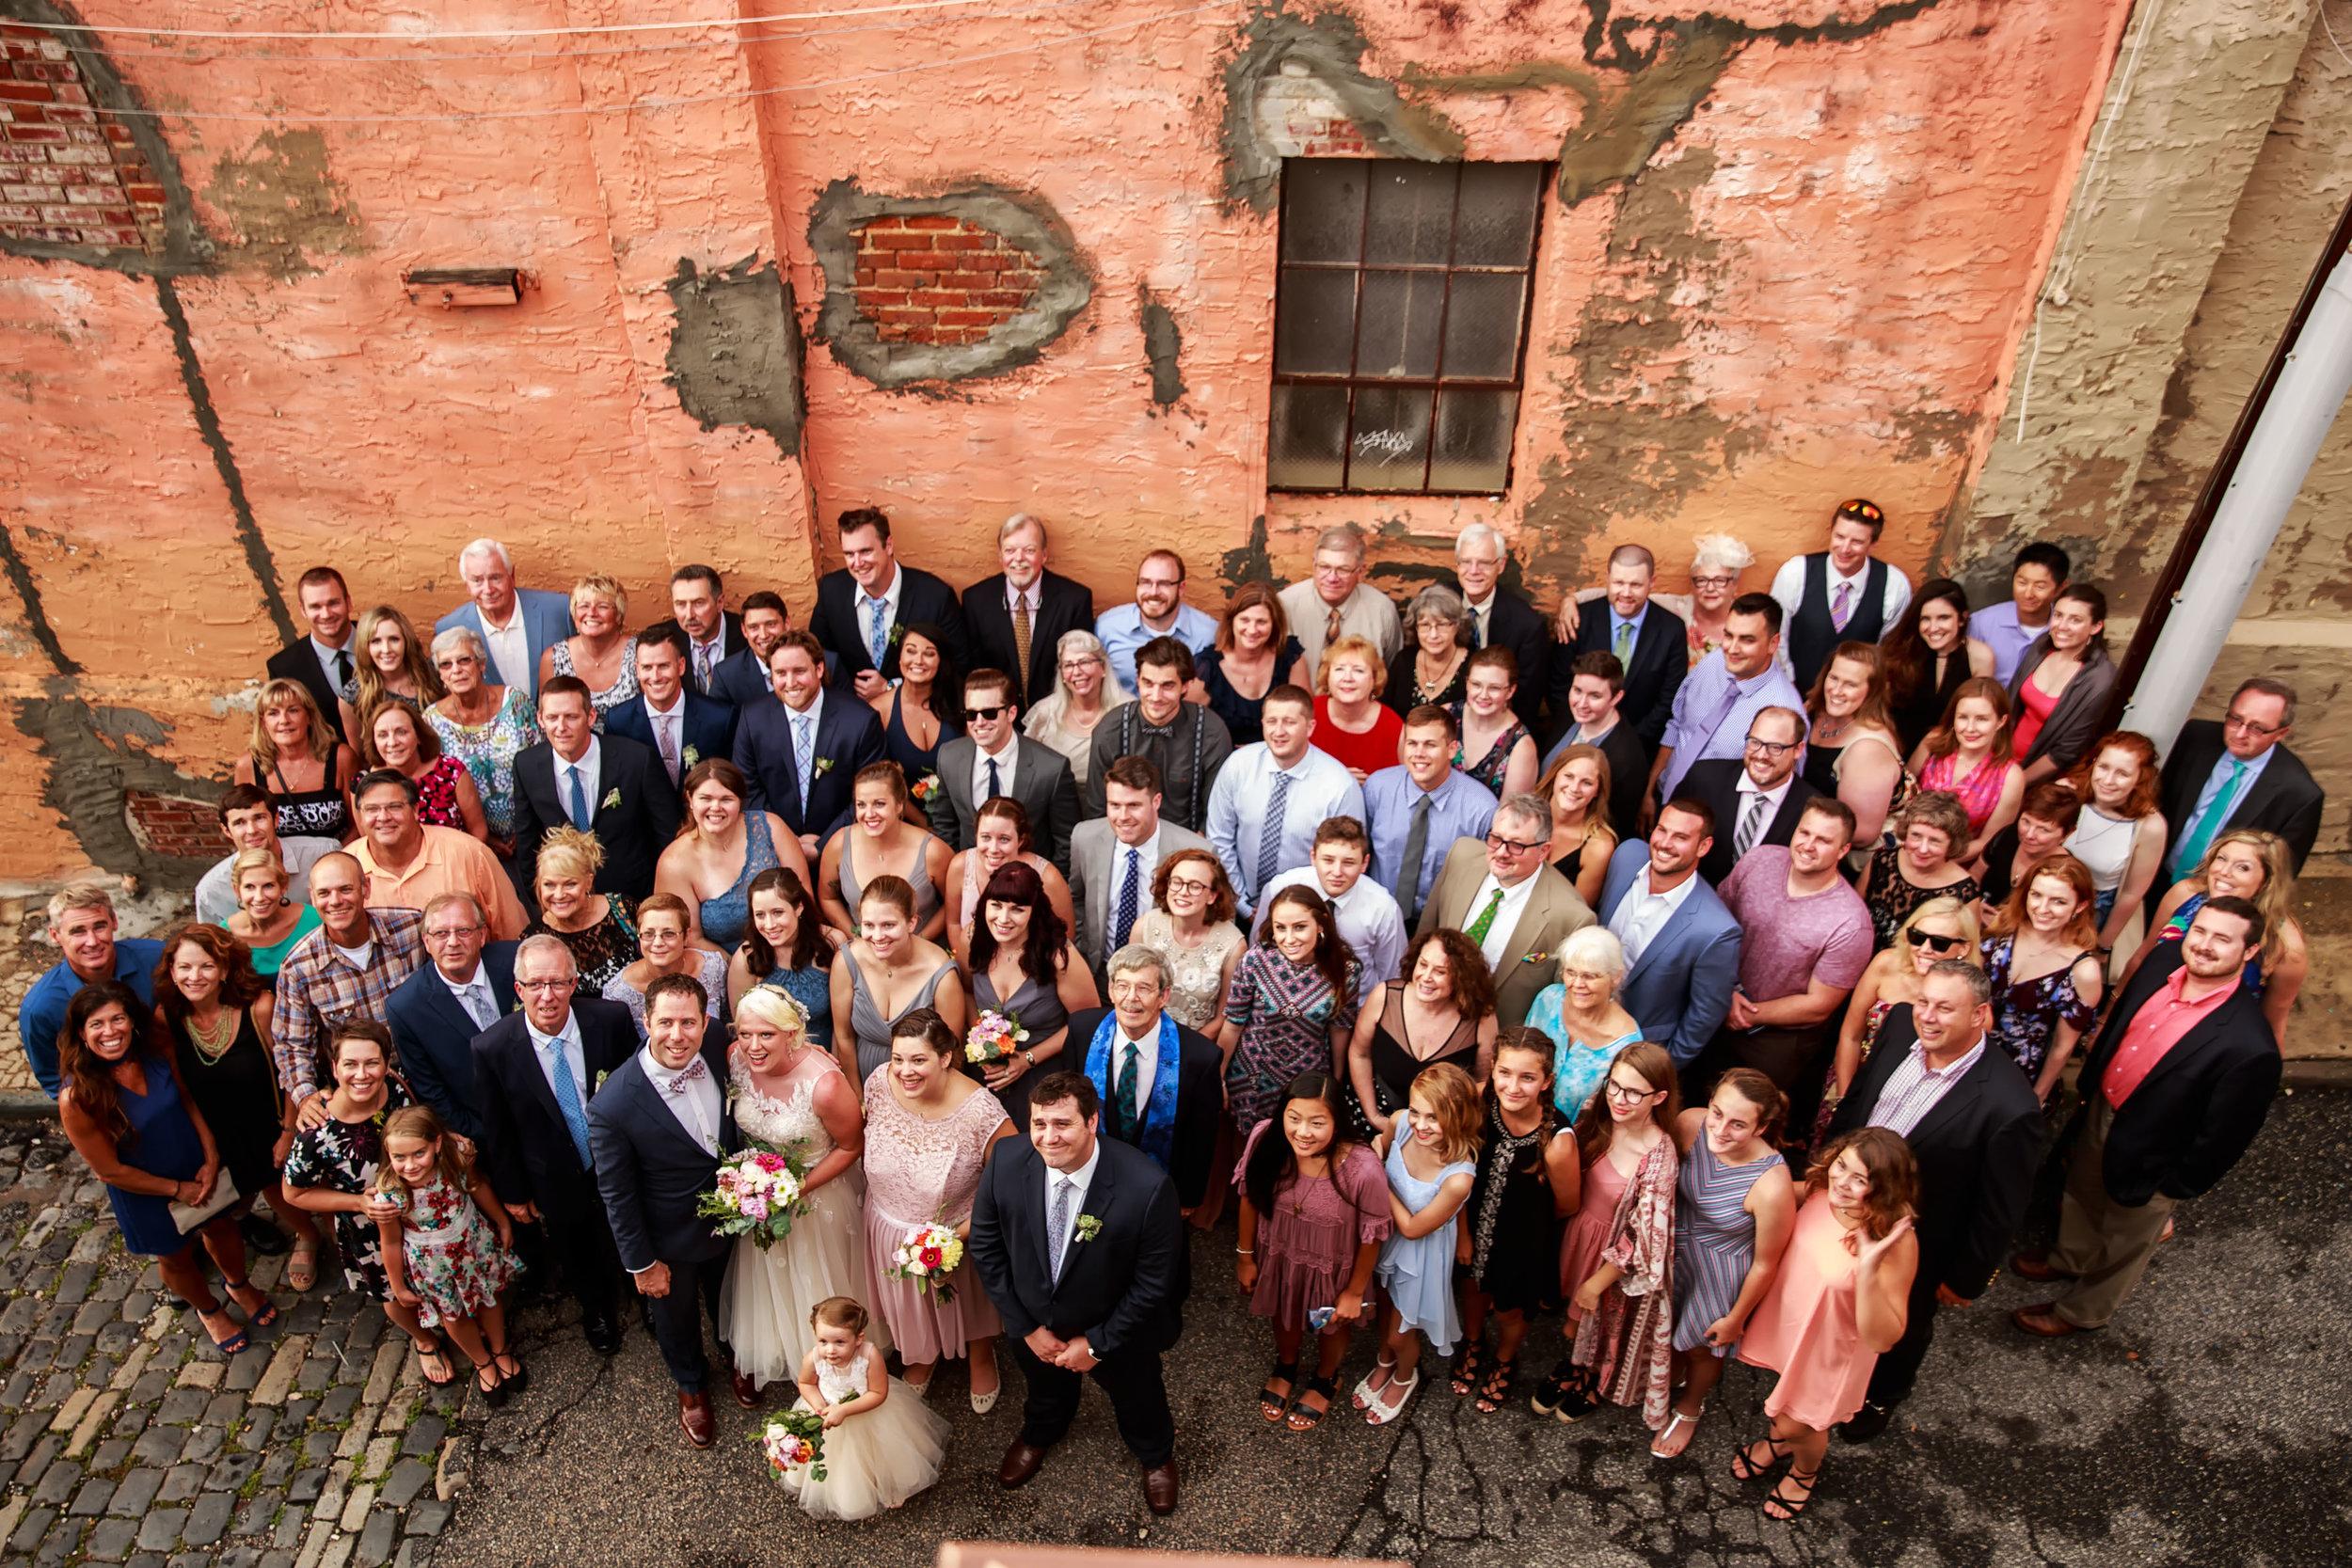 128-South-Wedding-Tiffany-Abruzzo-Photography-Group-62.jpg